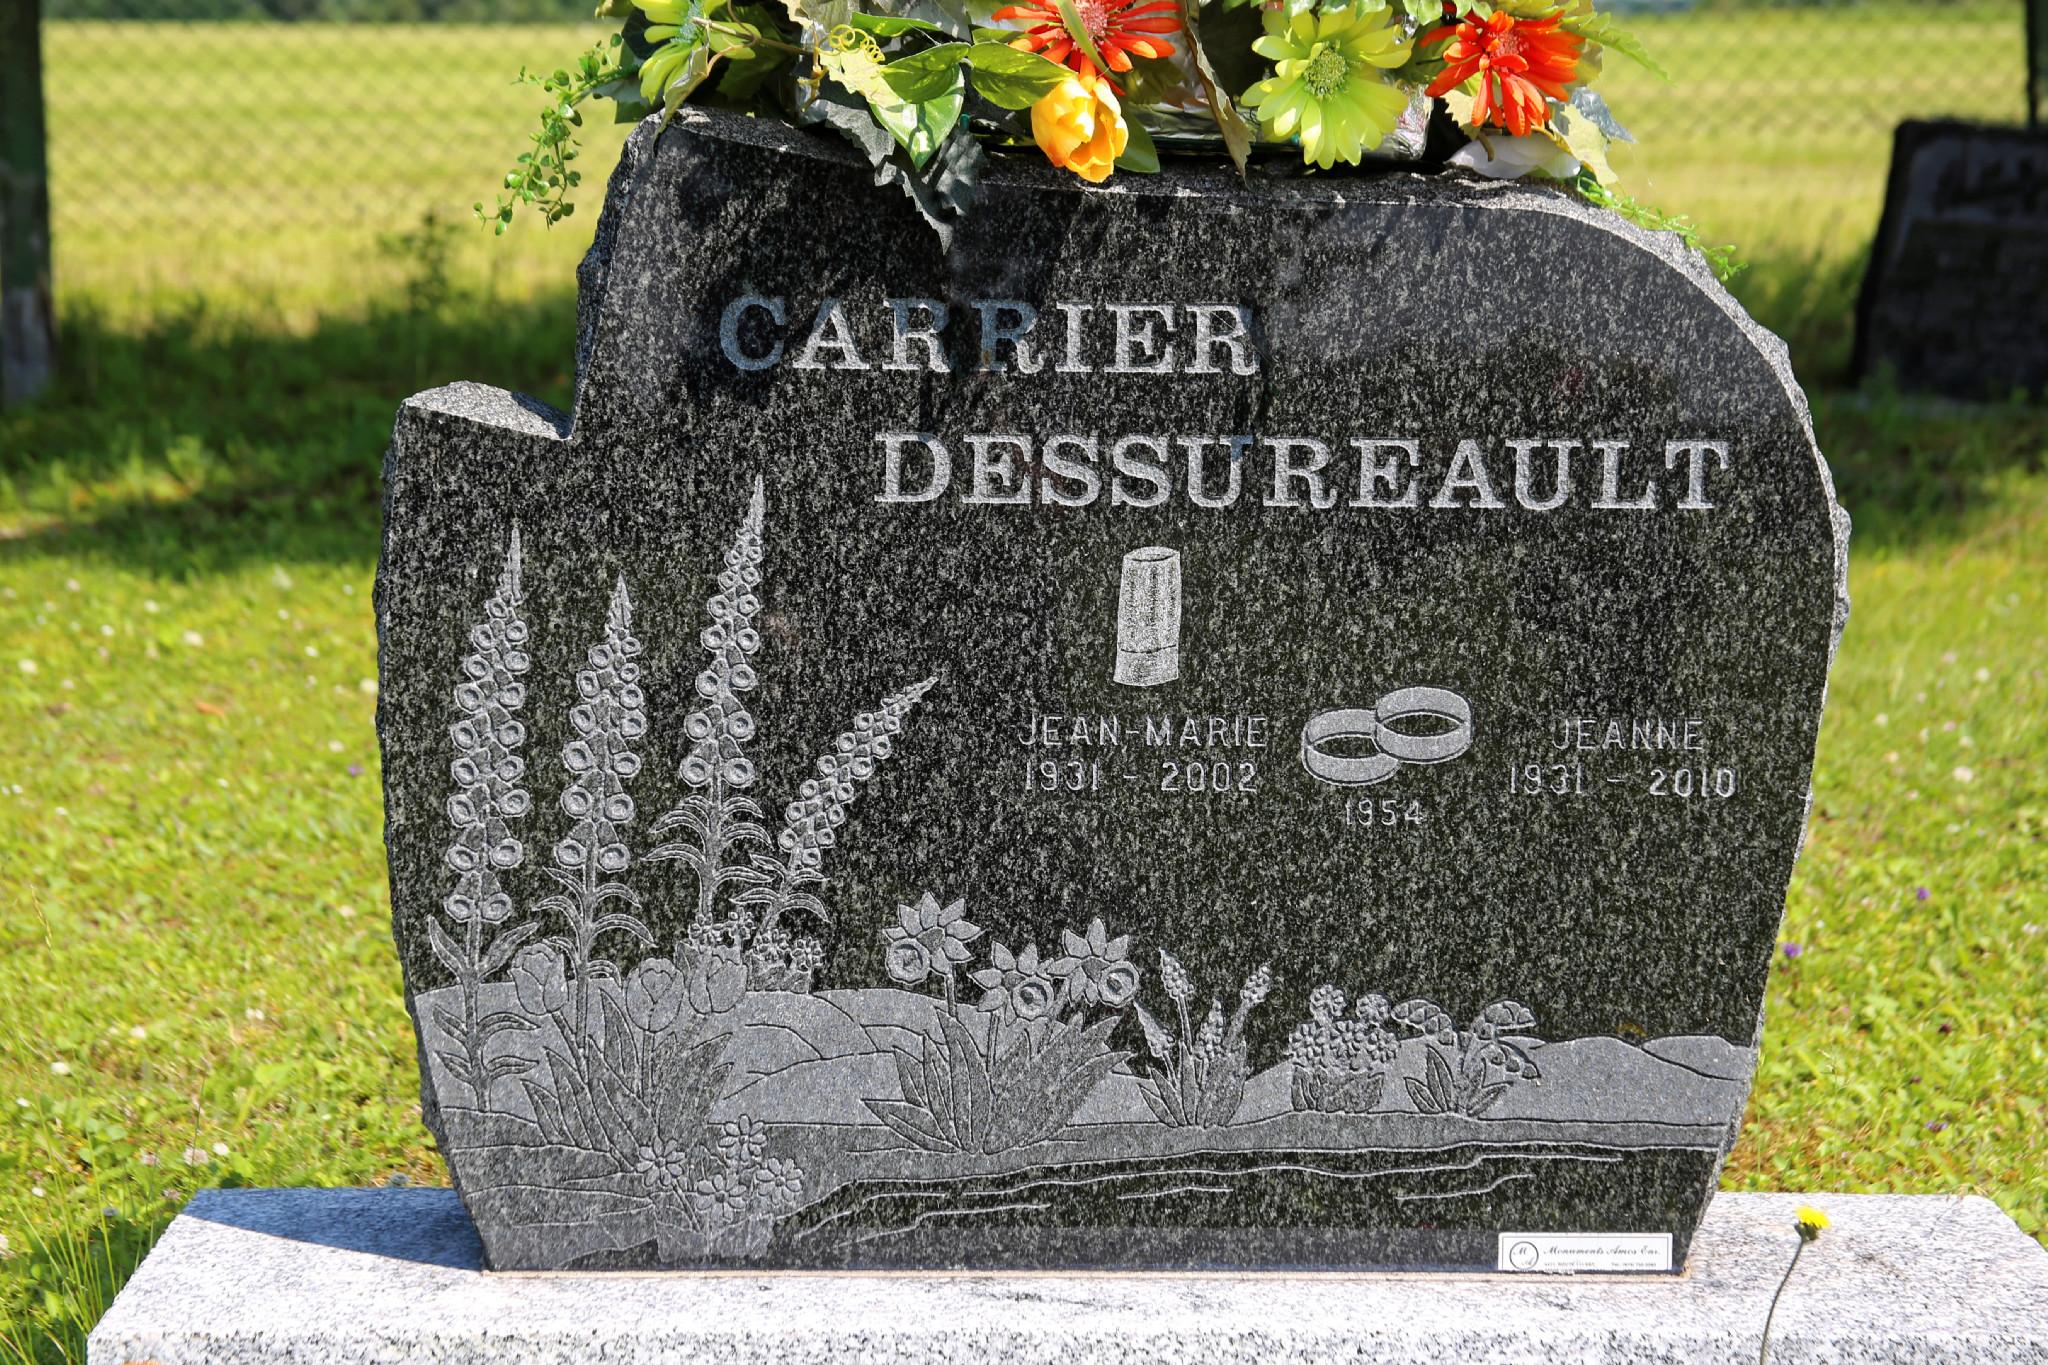 Jean-Marie Carrier